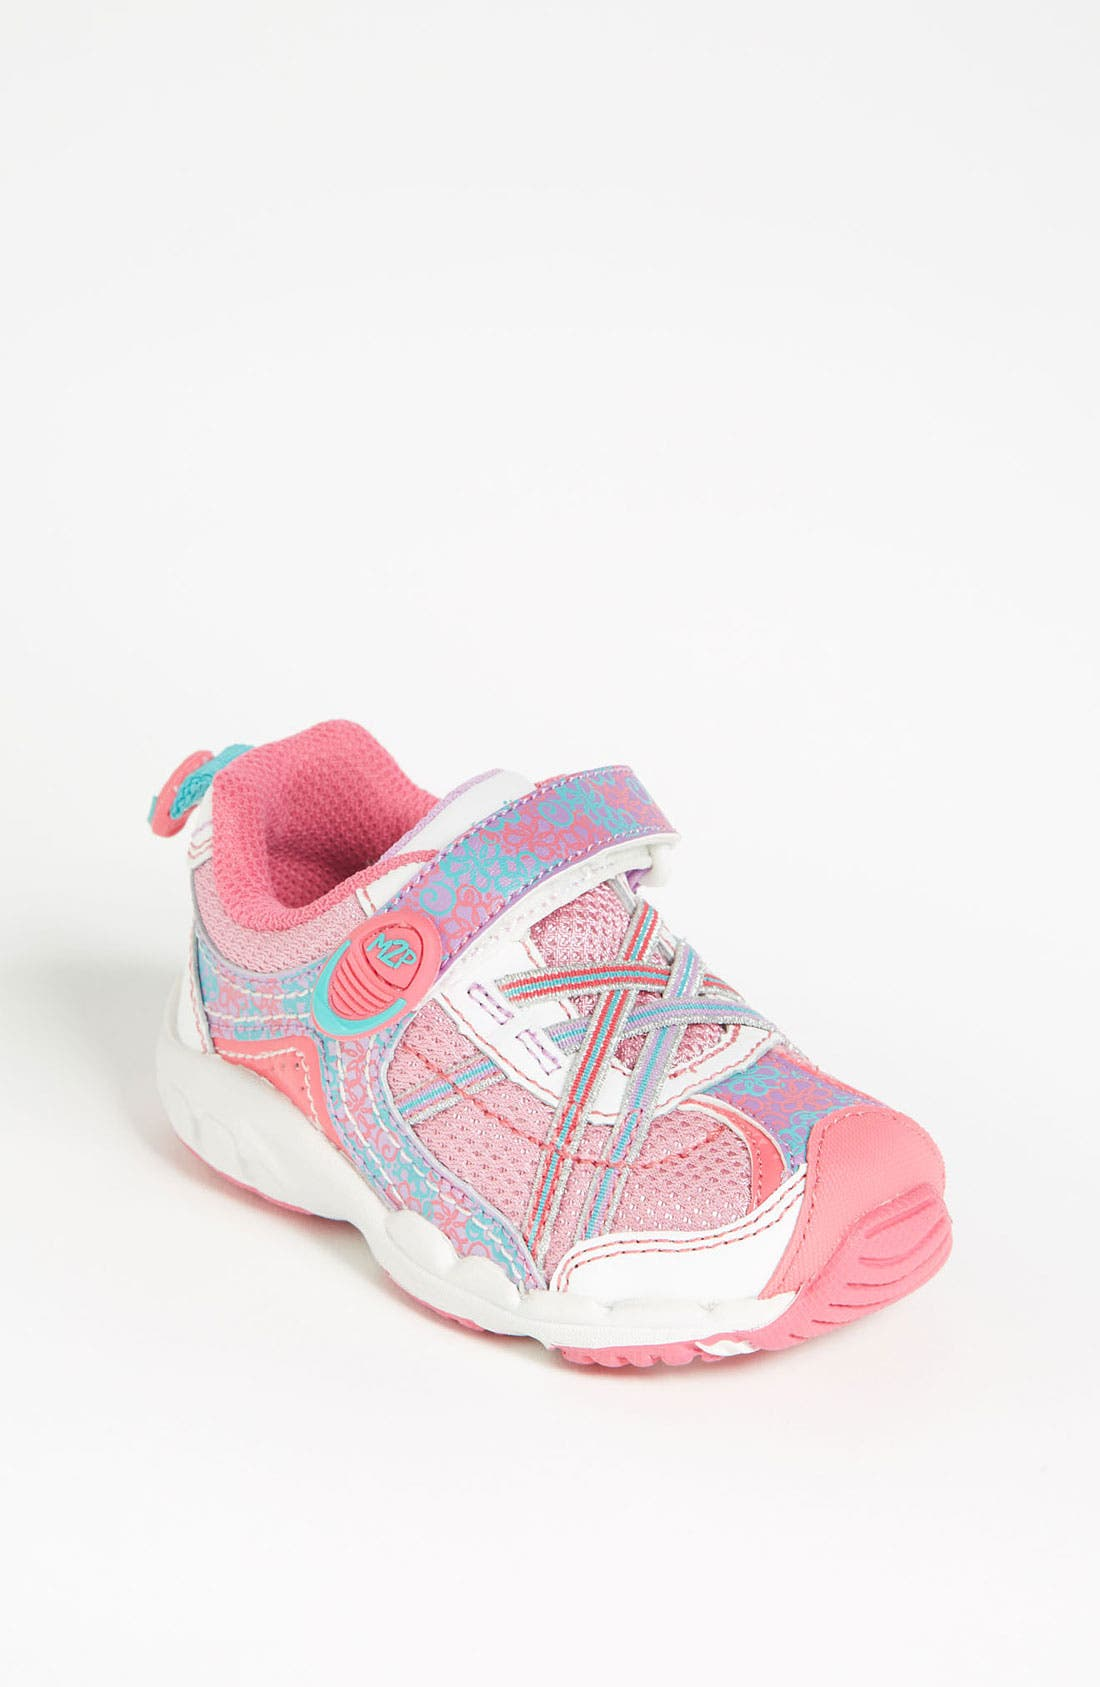 Alternate Image 1 Selected - Stride Rite 'Baby Kathryn' Sneaker (Baby, Walker & Toddler)